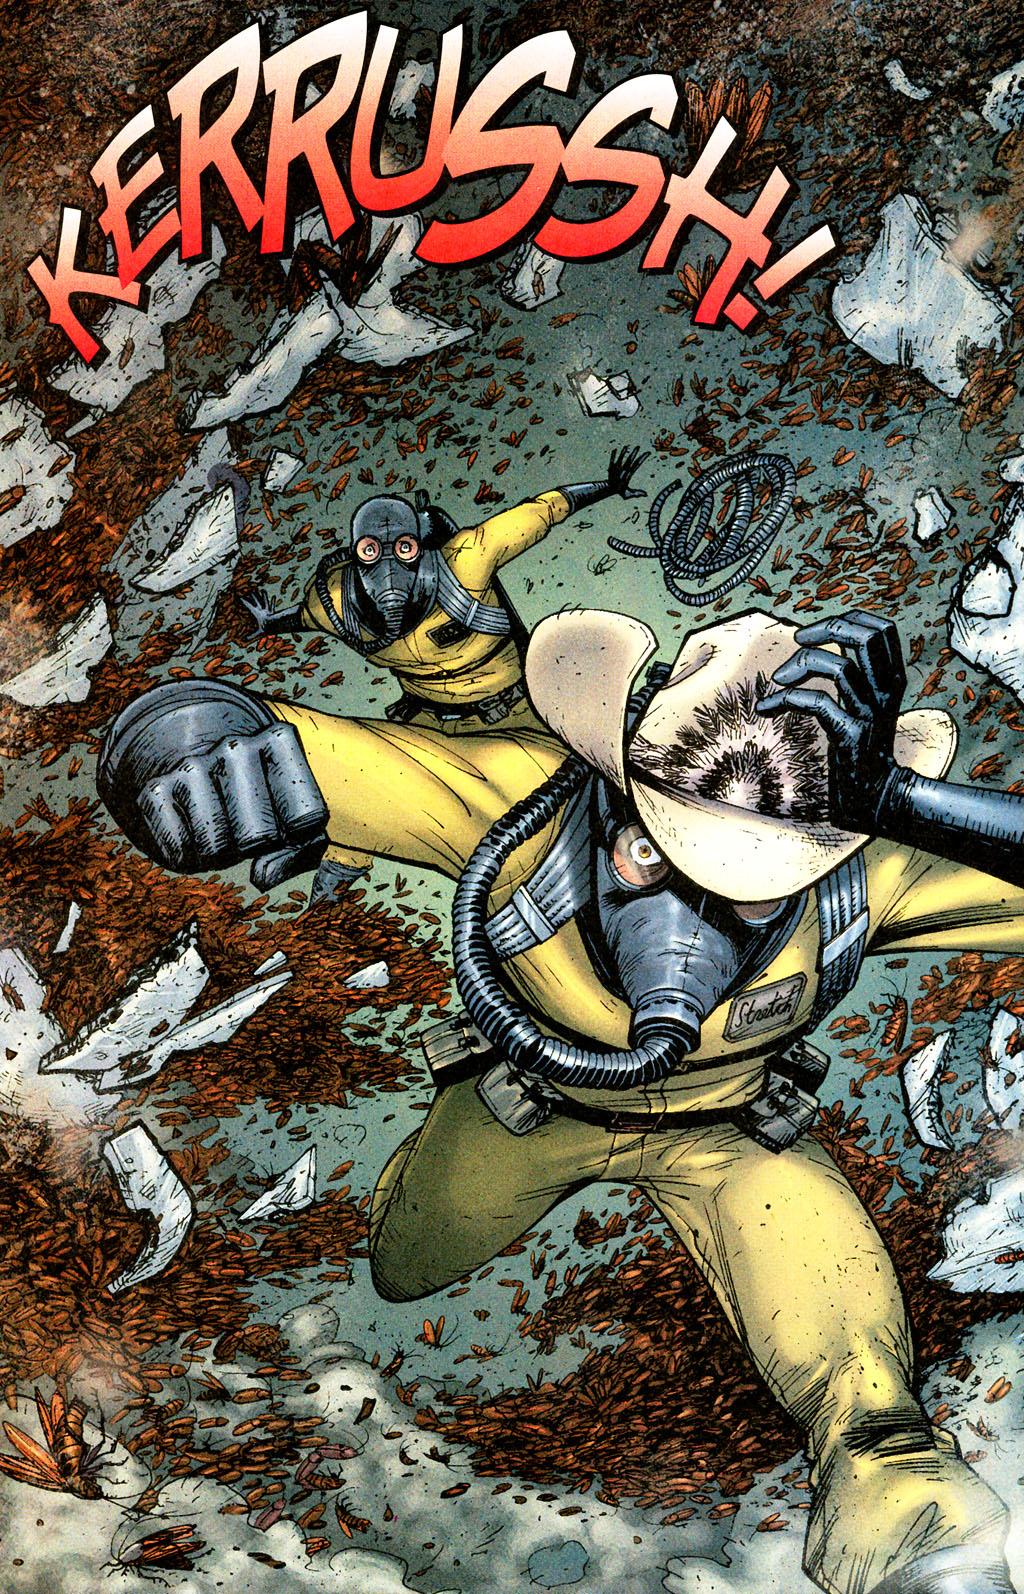 Read online The Exterminators comic -  Issue #5 - 11